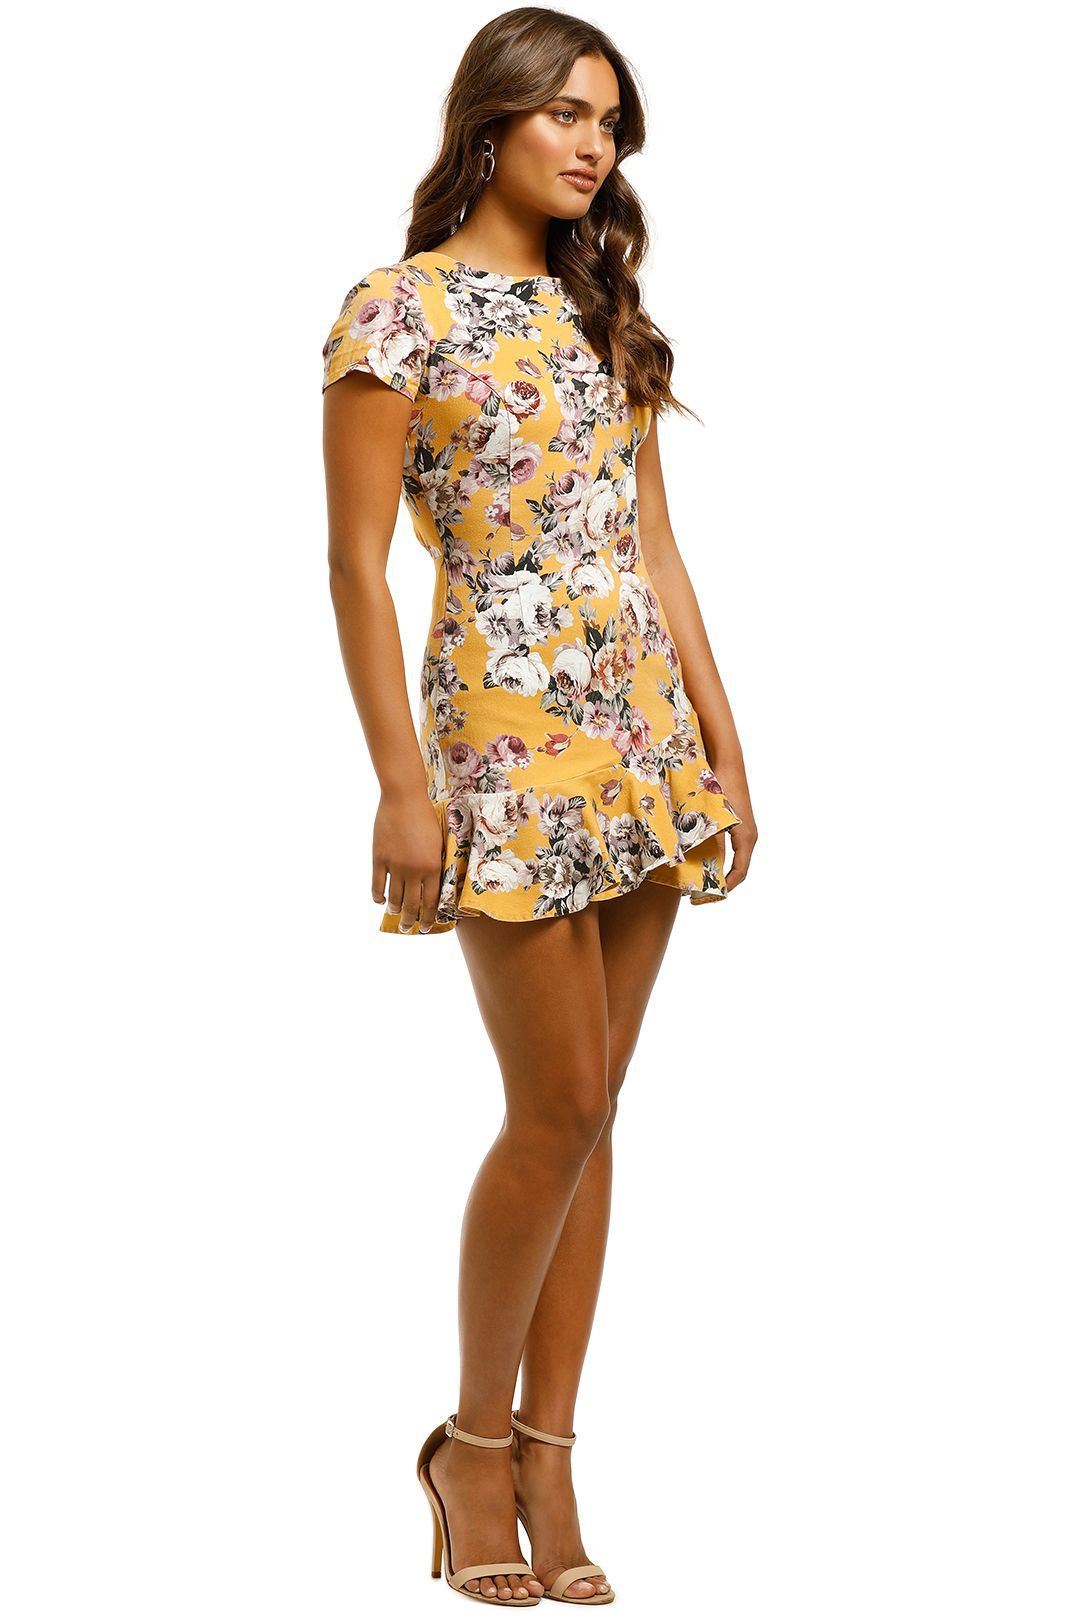 Pasduchas - Havana Flip Dress - Marigold - Side